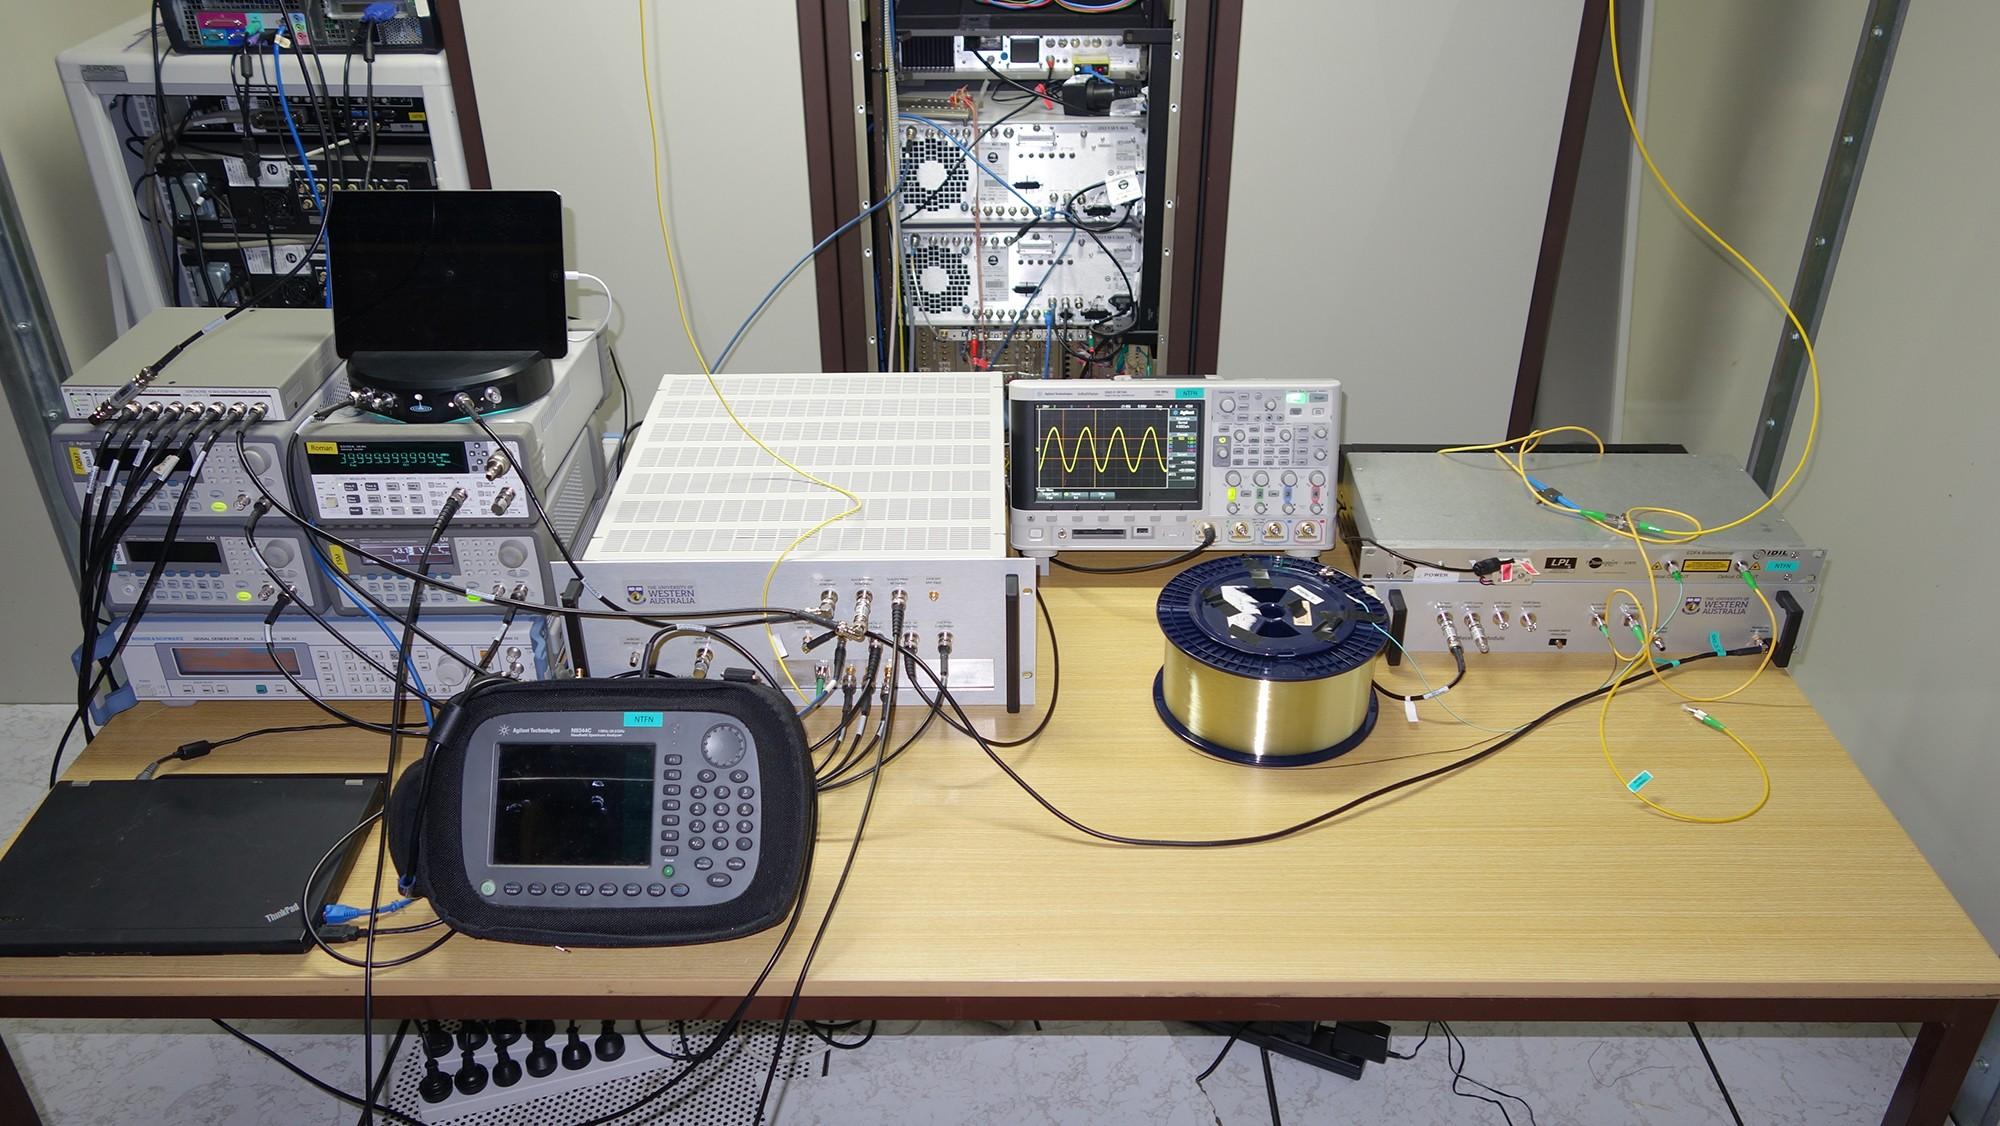 Equipment set up on a desk.